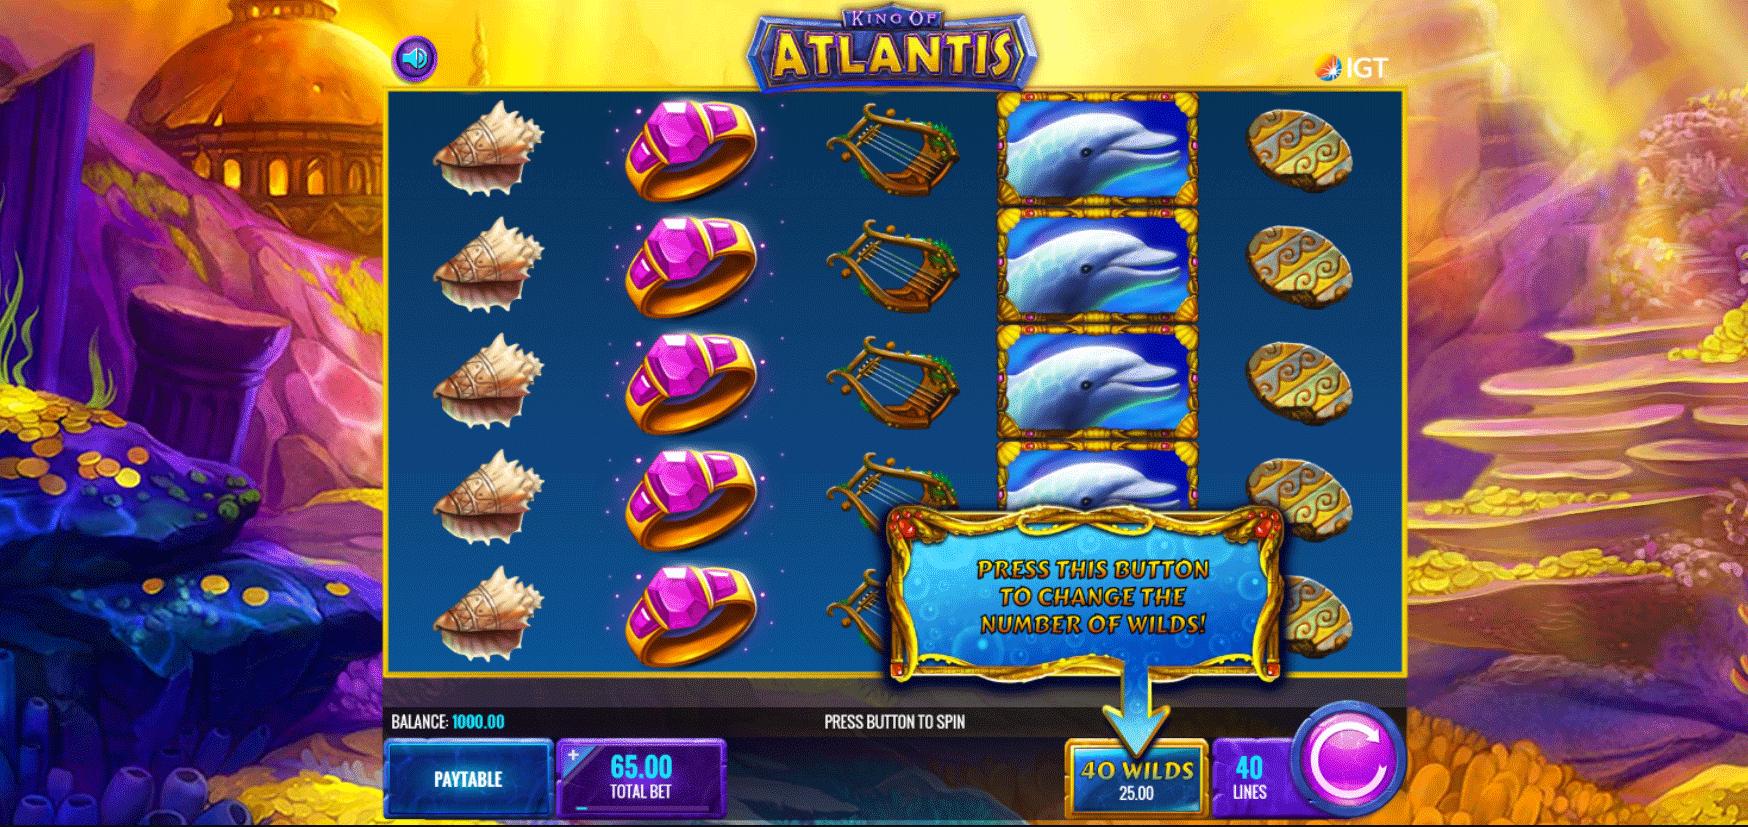 Slot King of Atlantis